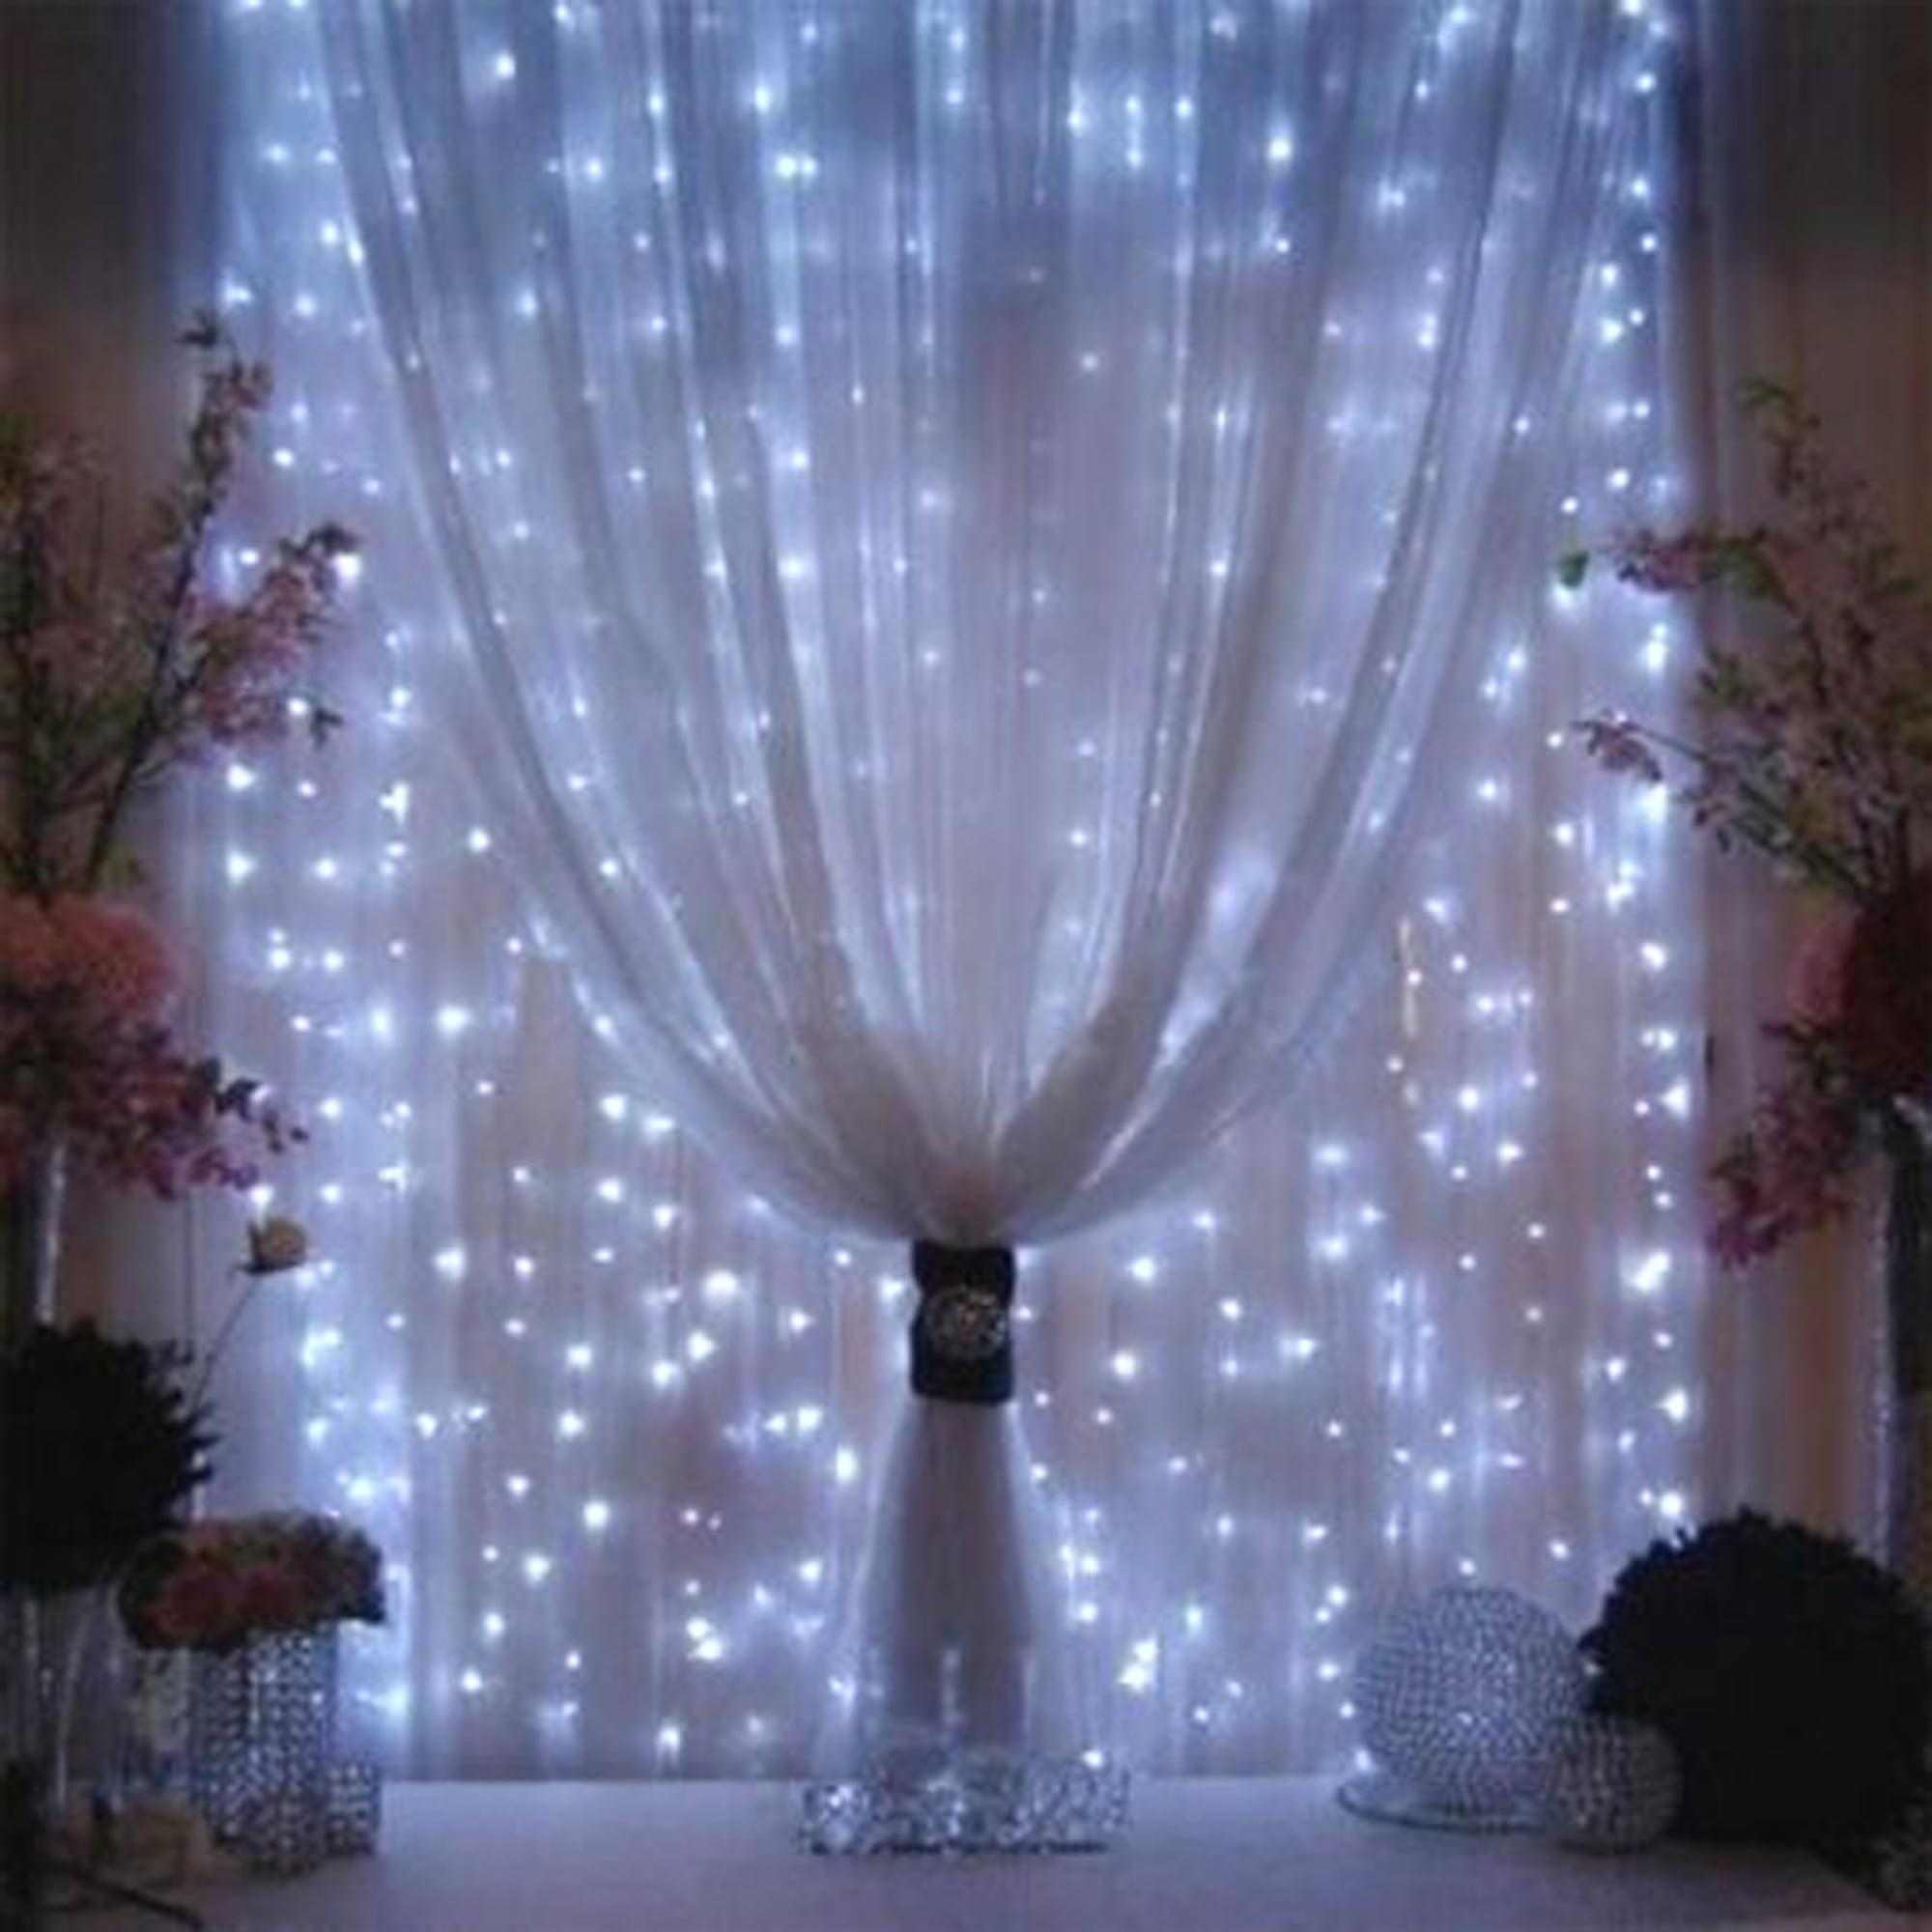 Curtain christmas lights - 3mx3m 300led String Light Curtain Light For Christmas Xmas Wedding Party Home Decoration White Walmart Com